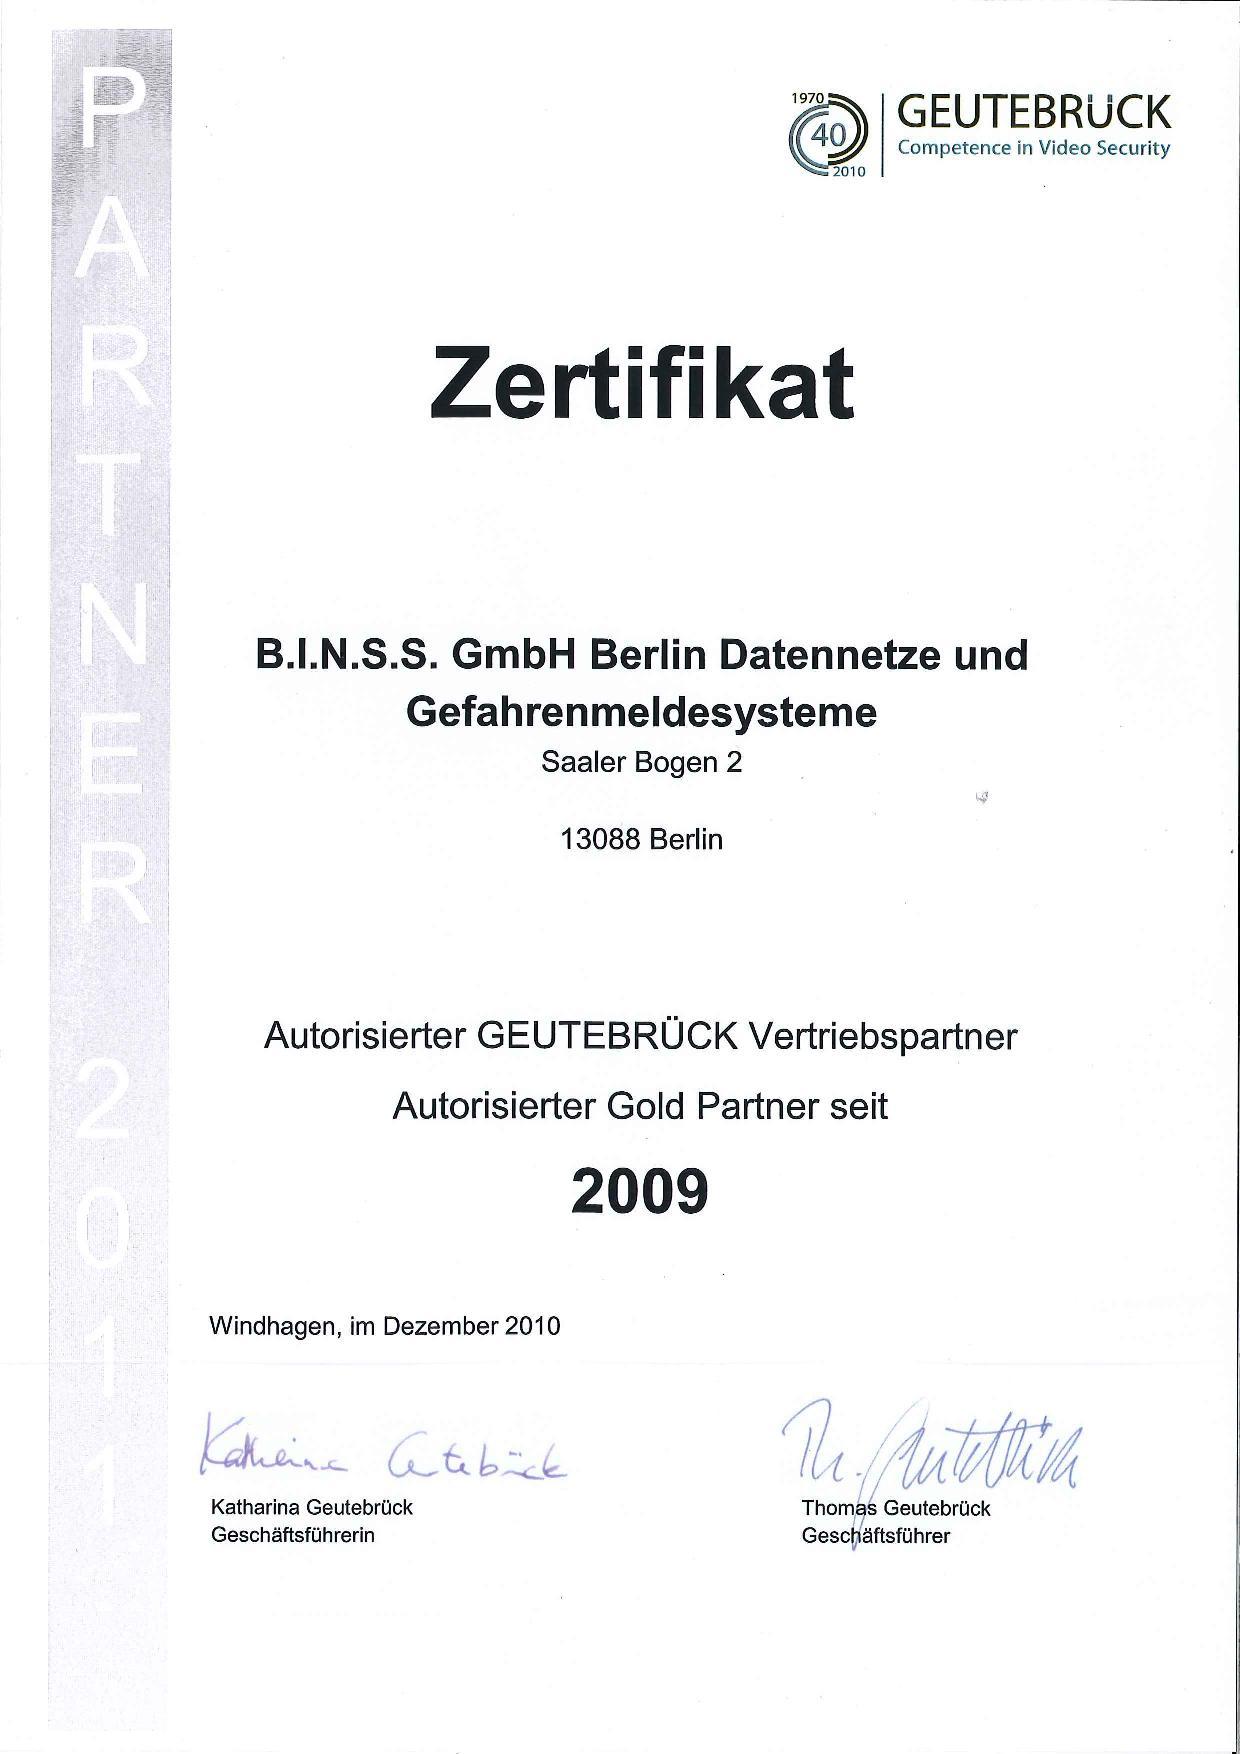 Geutebrück Autorisierter Vertriebspartner